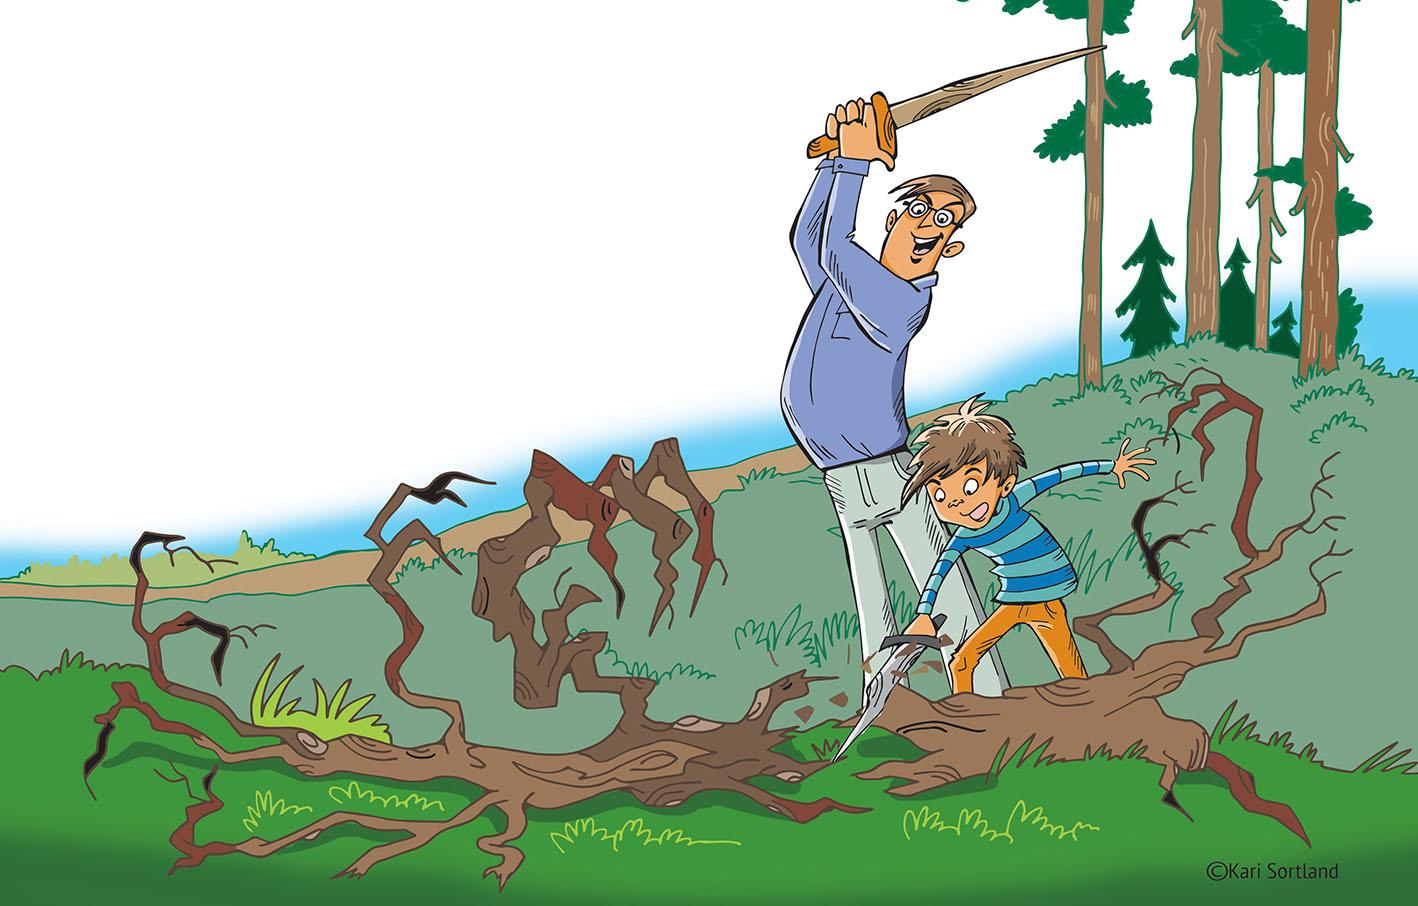 Barnebok, illustrasjoner kari Sortland